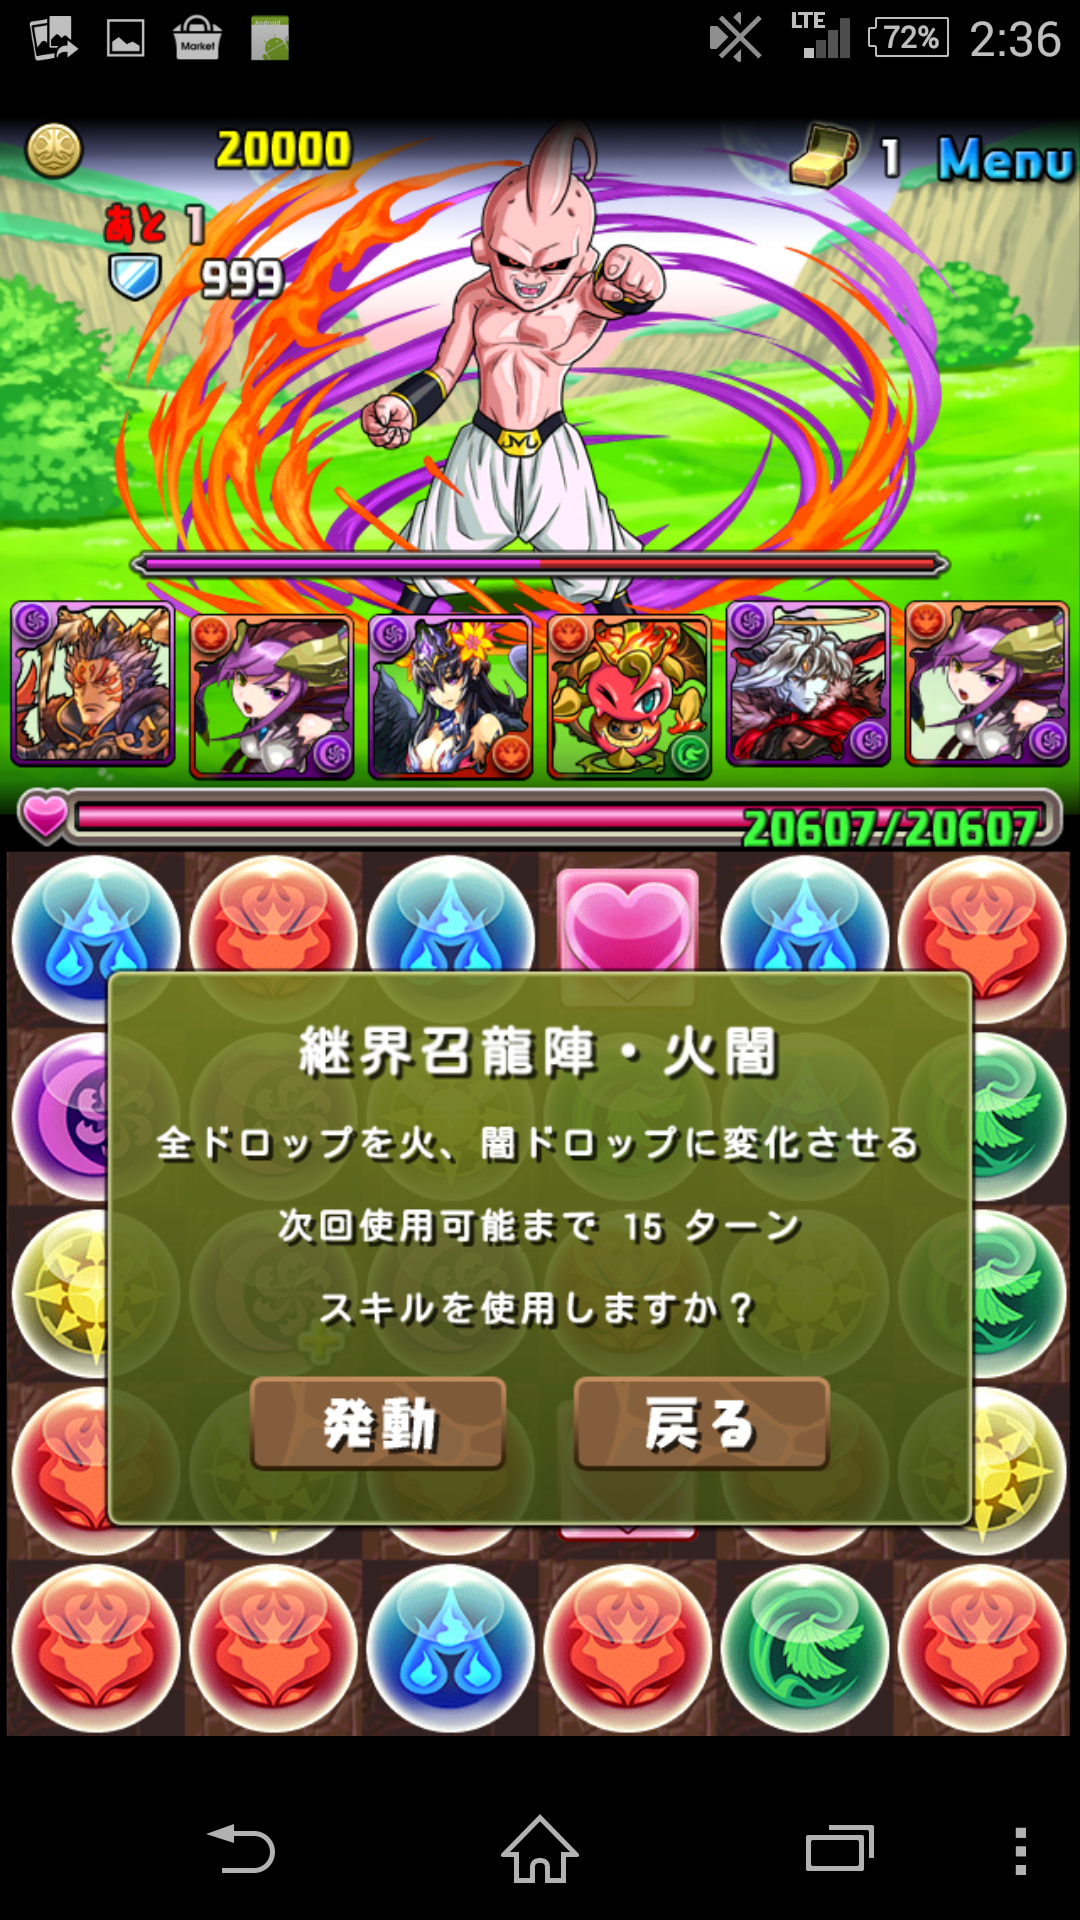 Screenshot_2014-09-26-02-36-02.png